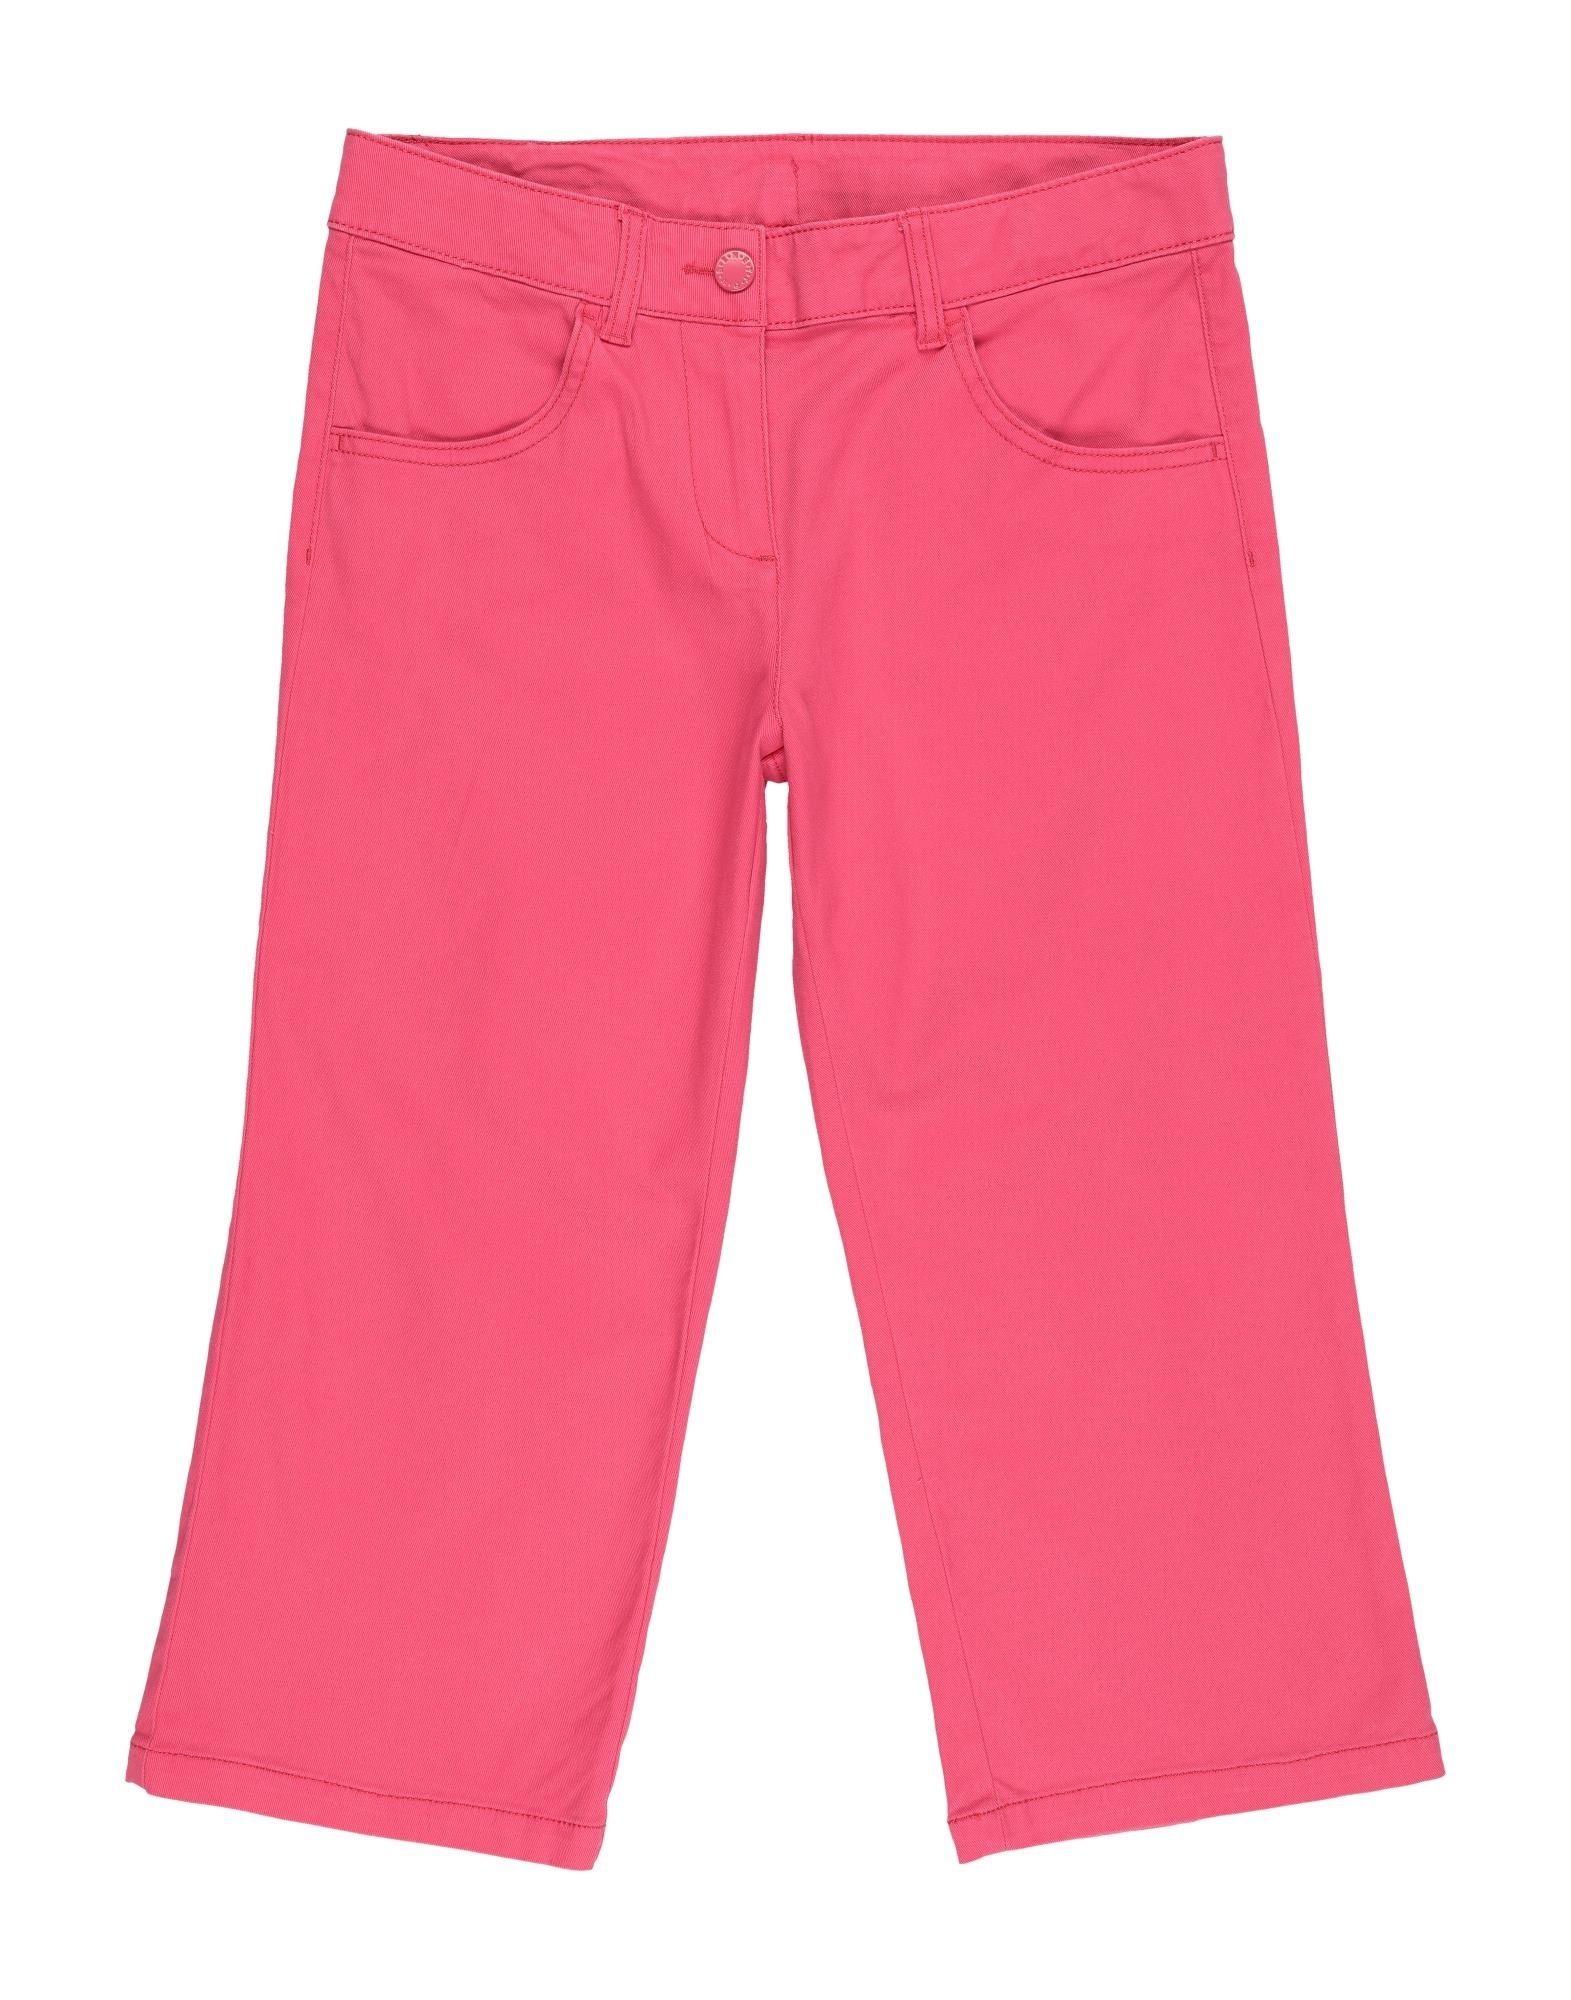 UNITED COLORS OF BENETTON Повседневные брюки